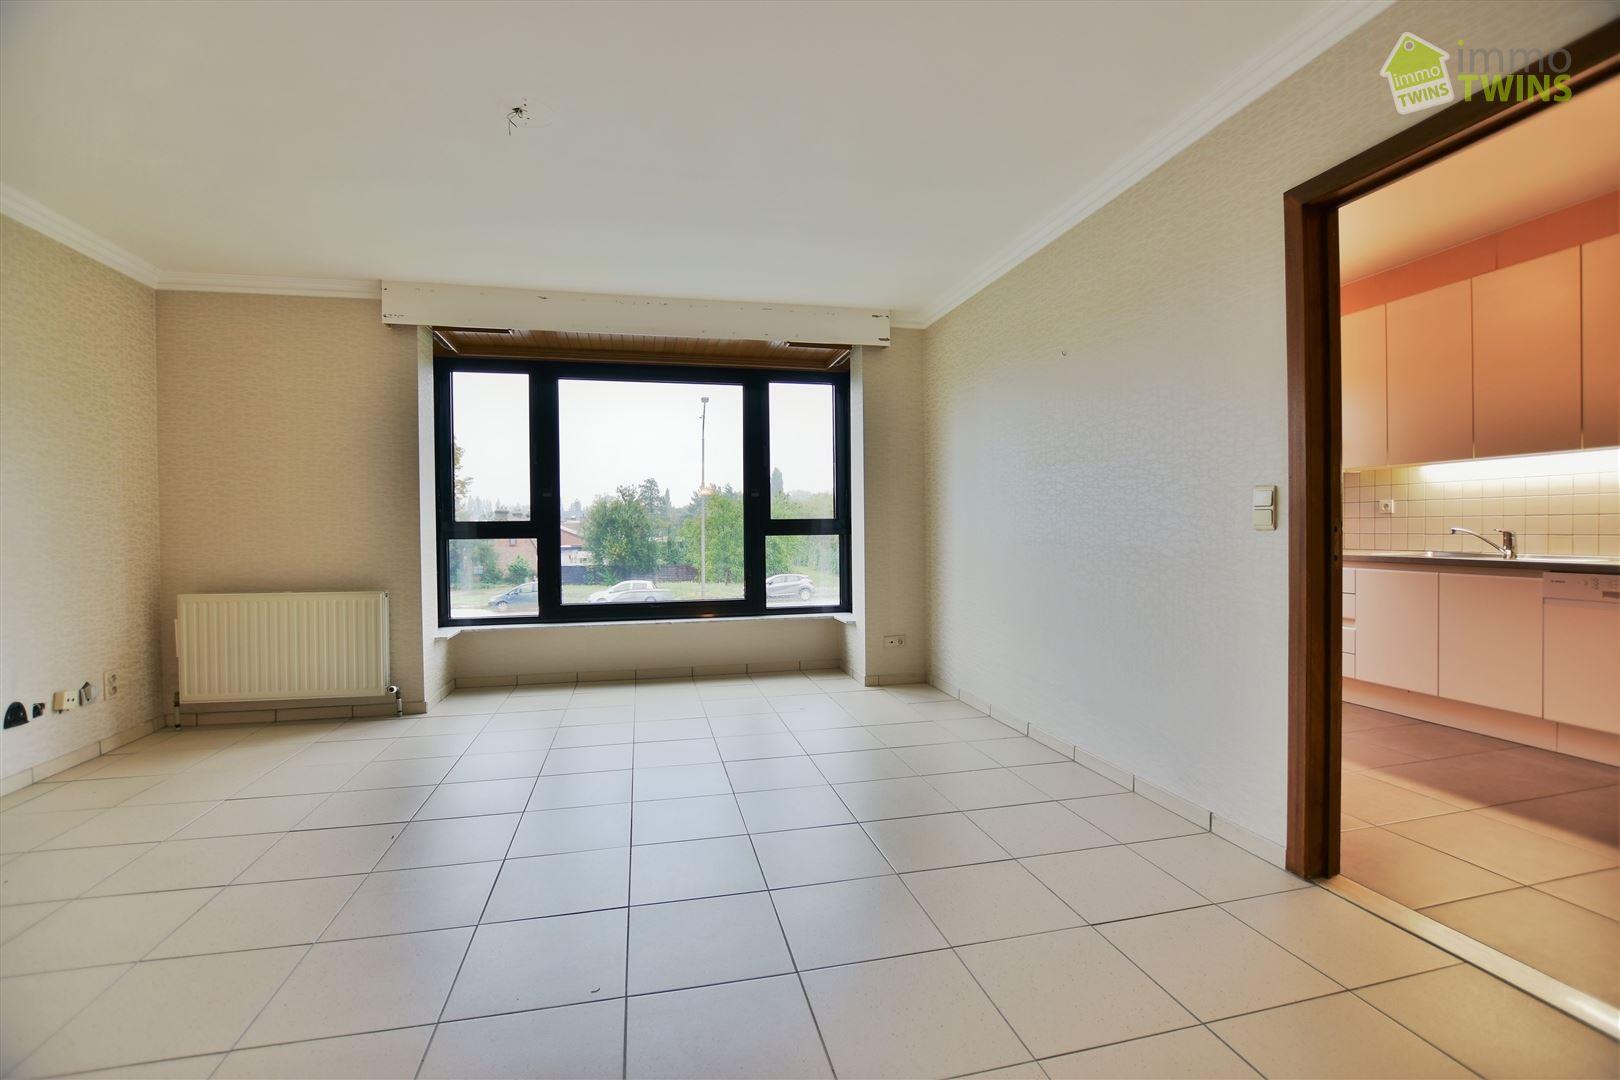 Foto 6 : Appartement te 9200 DENDERMONDE (België) - Prijs € 725